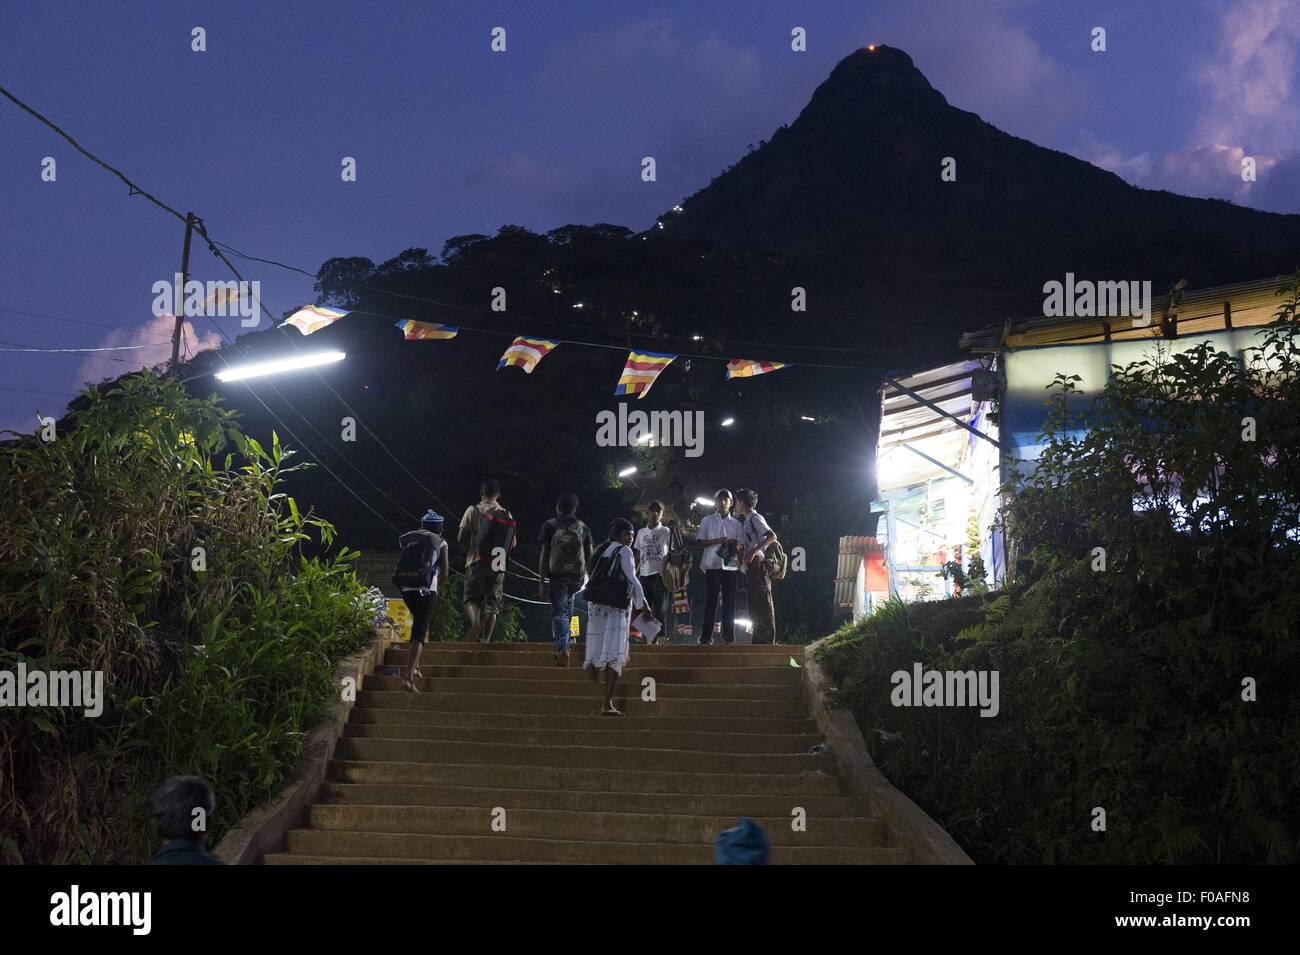 Sri Mariamman Temple at night. Chinatown, Singapore Stock Photo ...